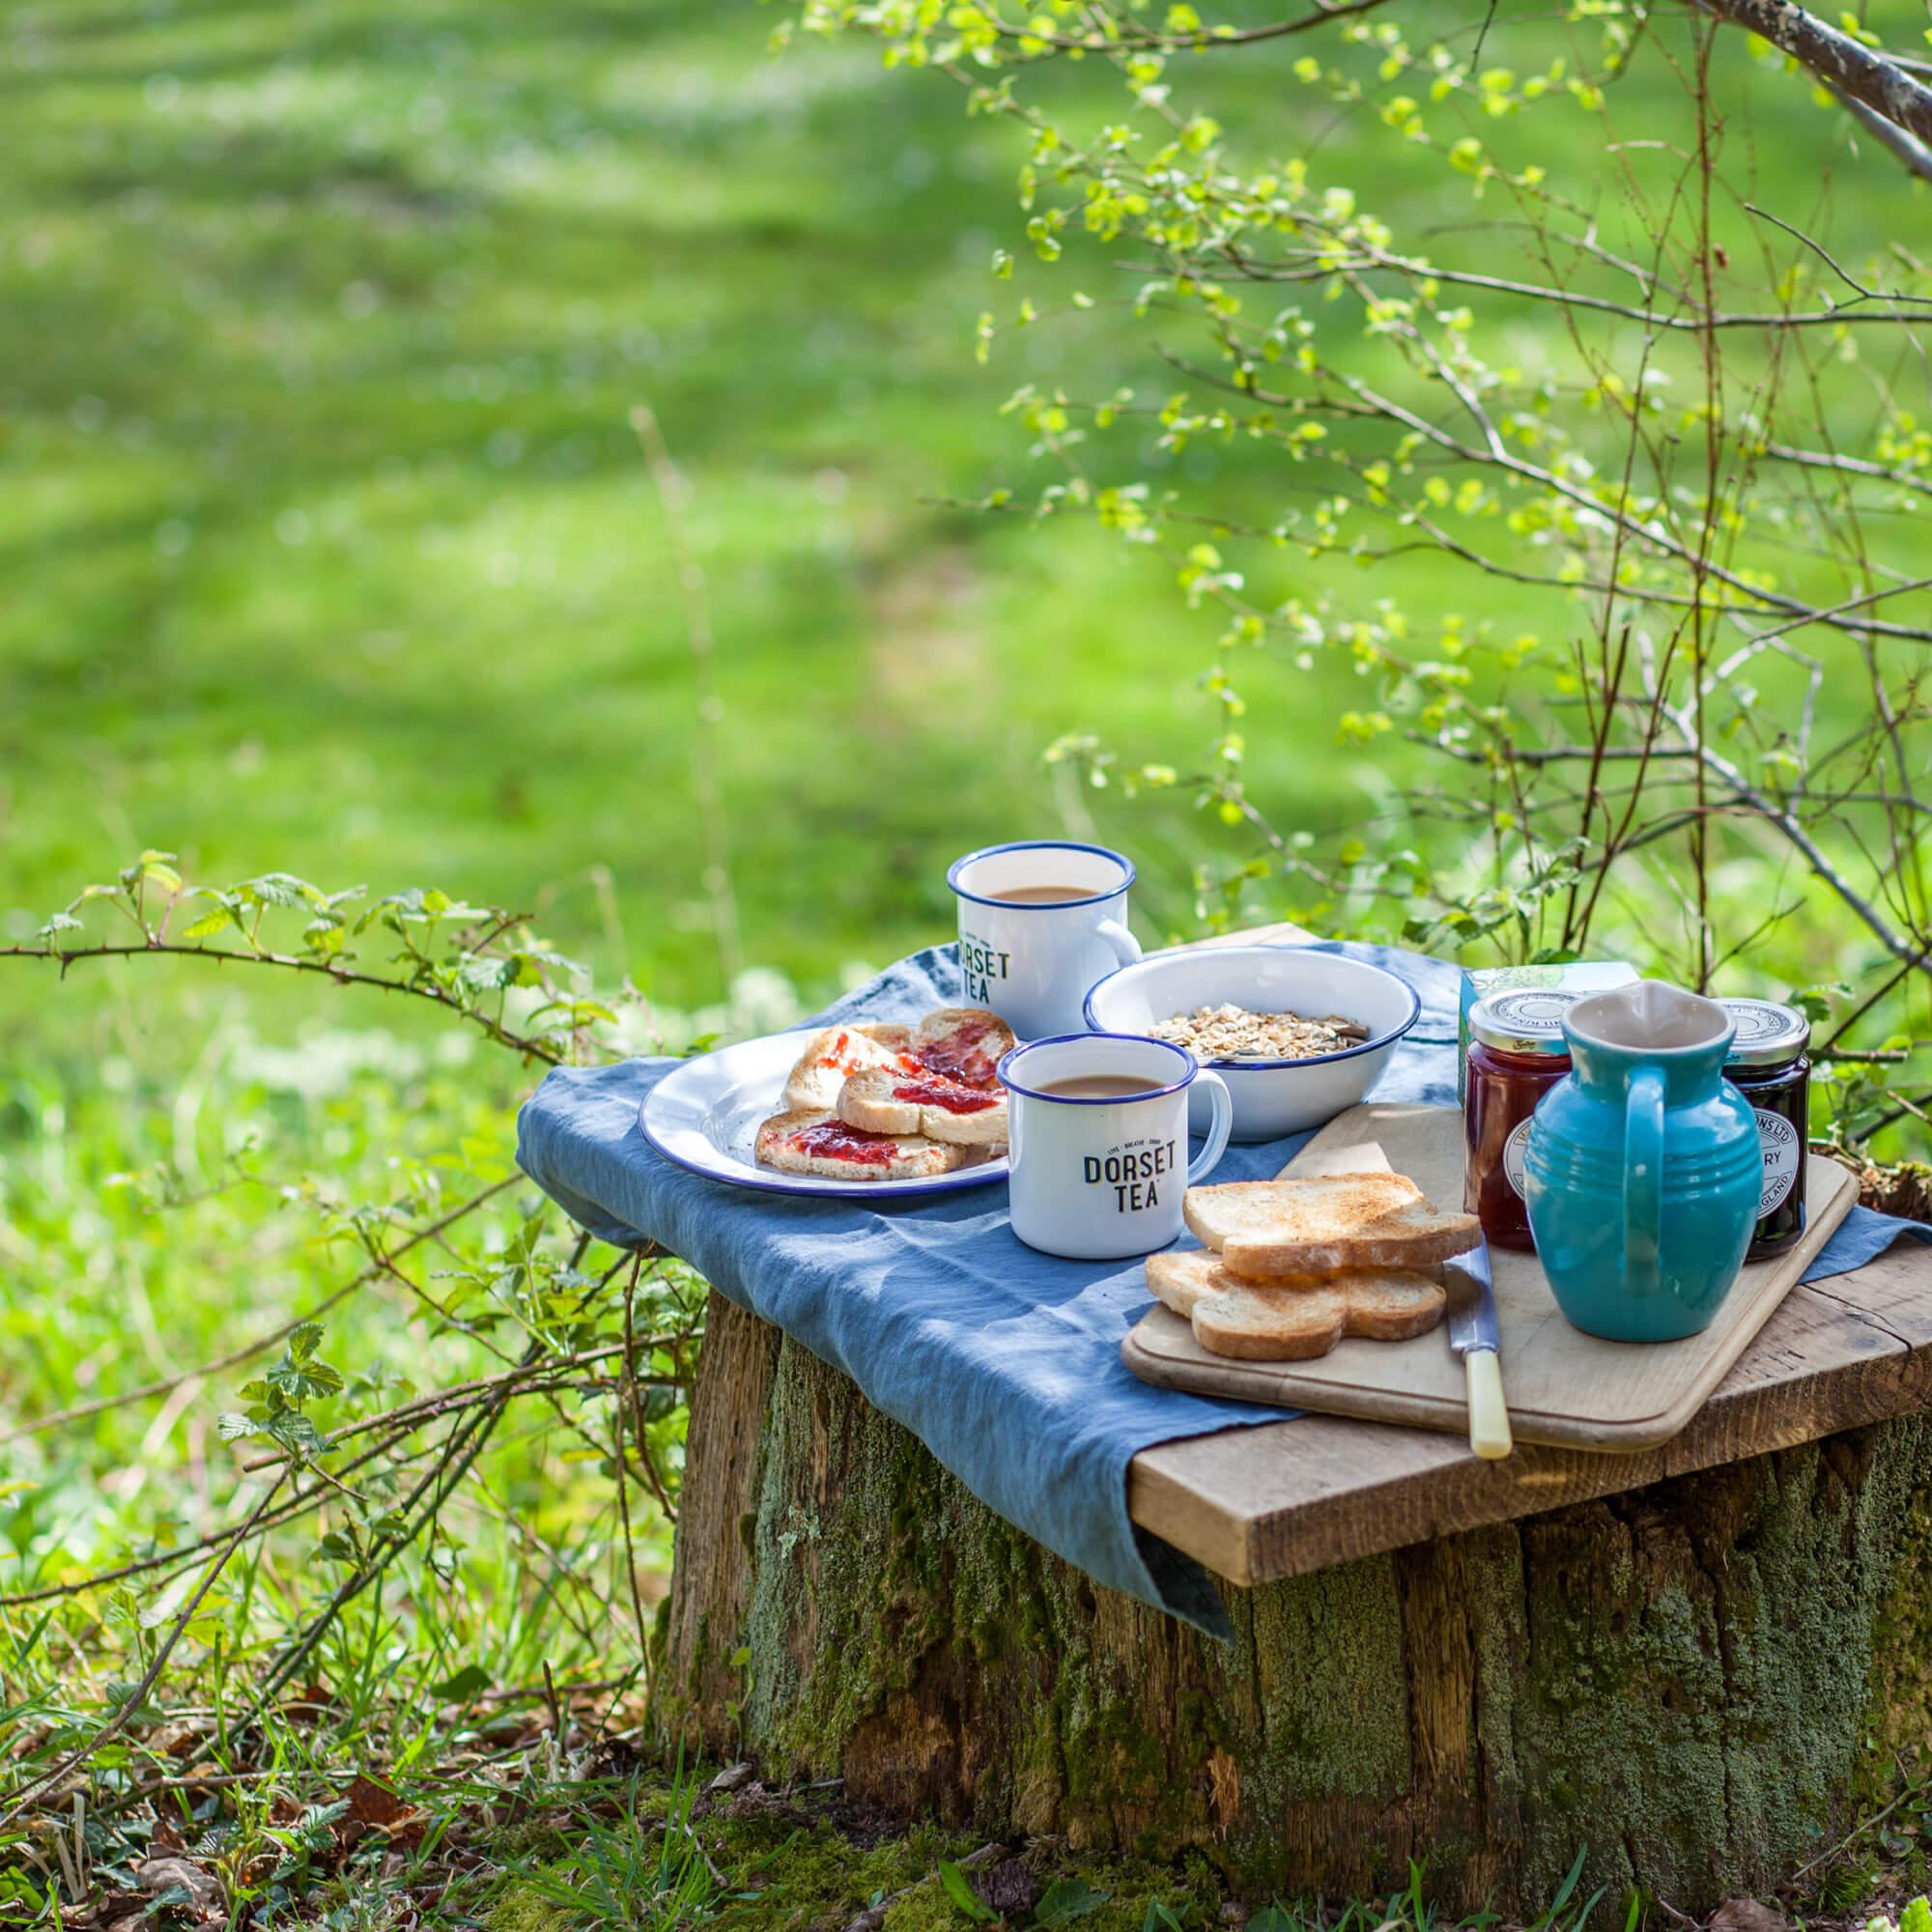 Lara Jane thorpe - commercial photography dorset -Dorset Tea